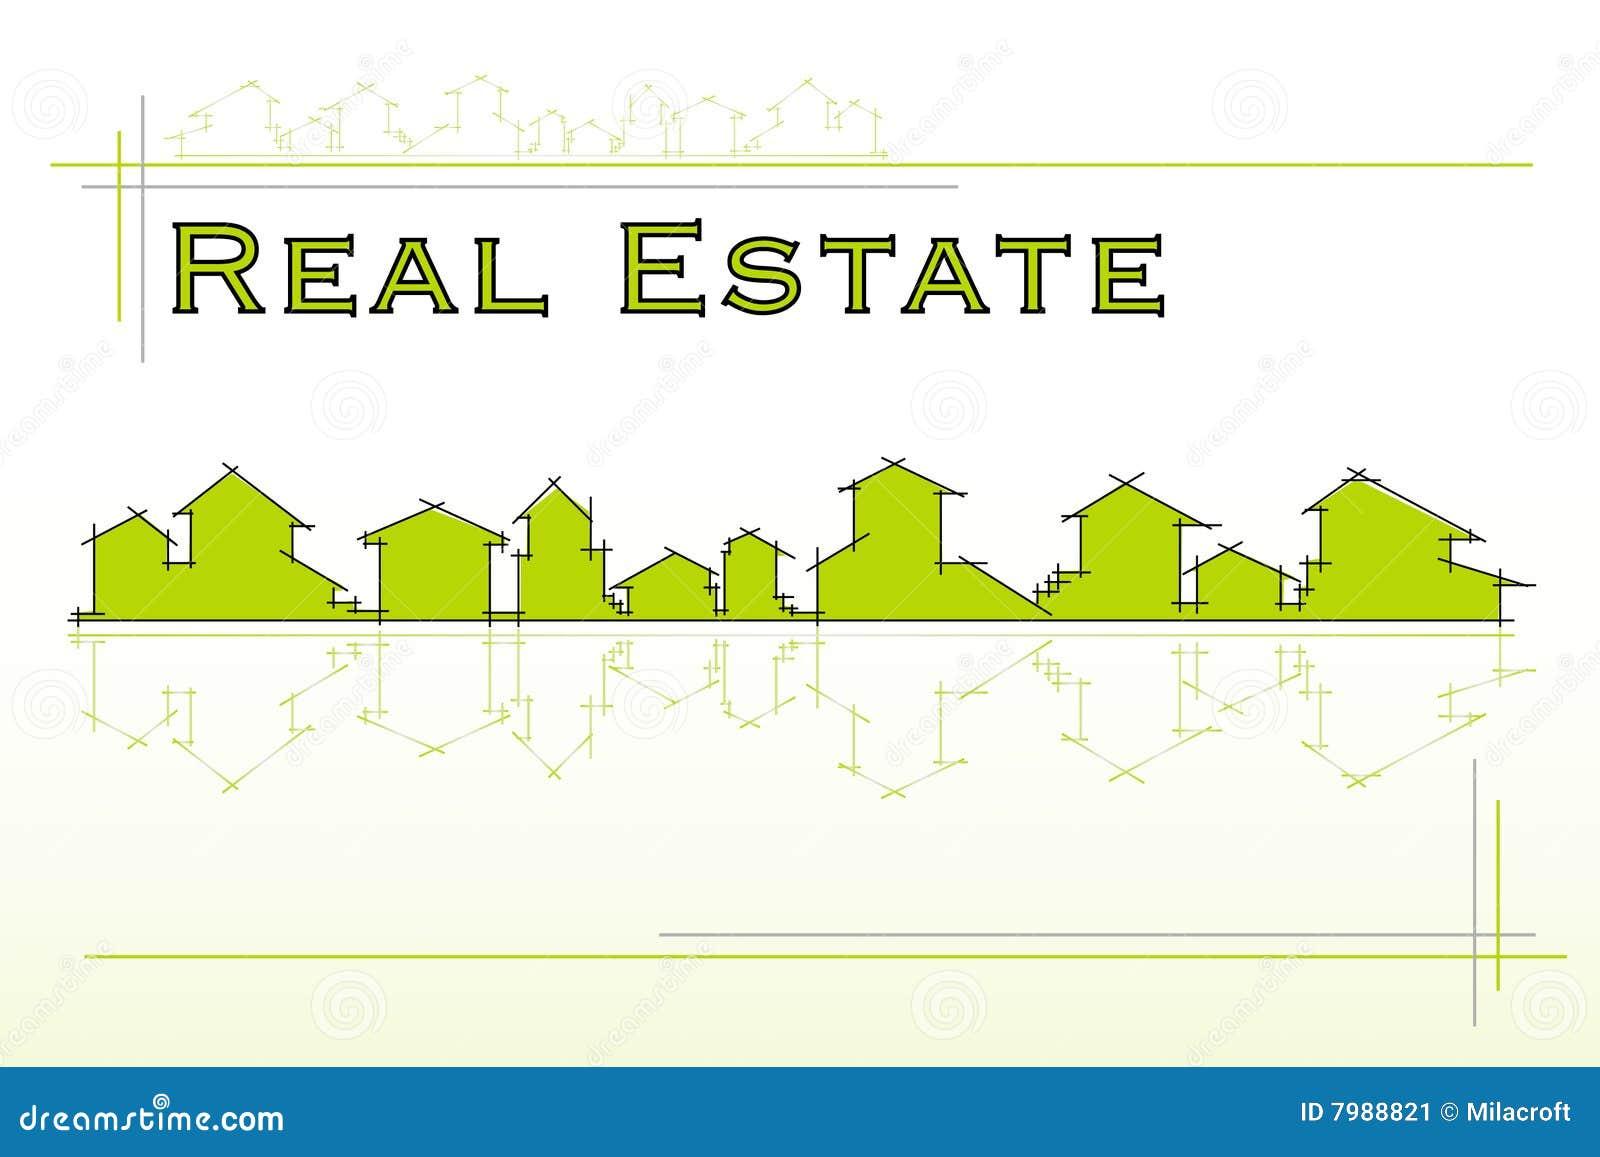 Real estate company stock image